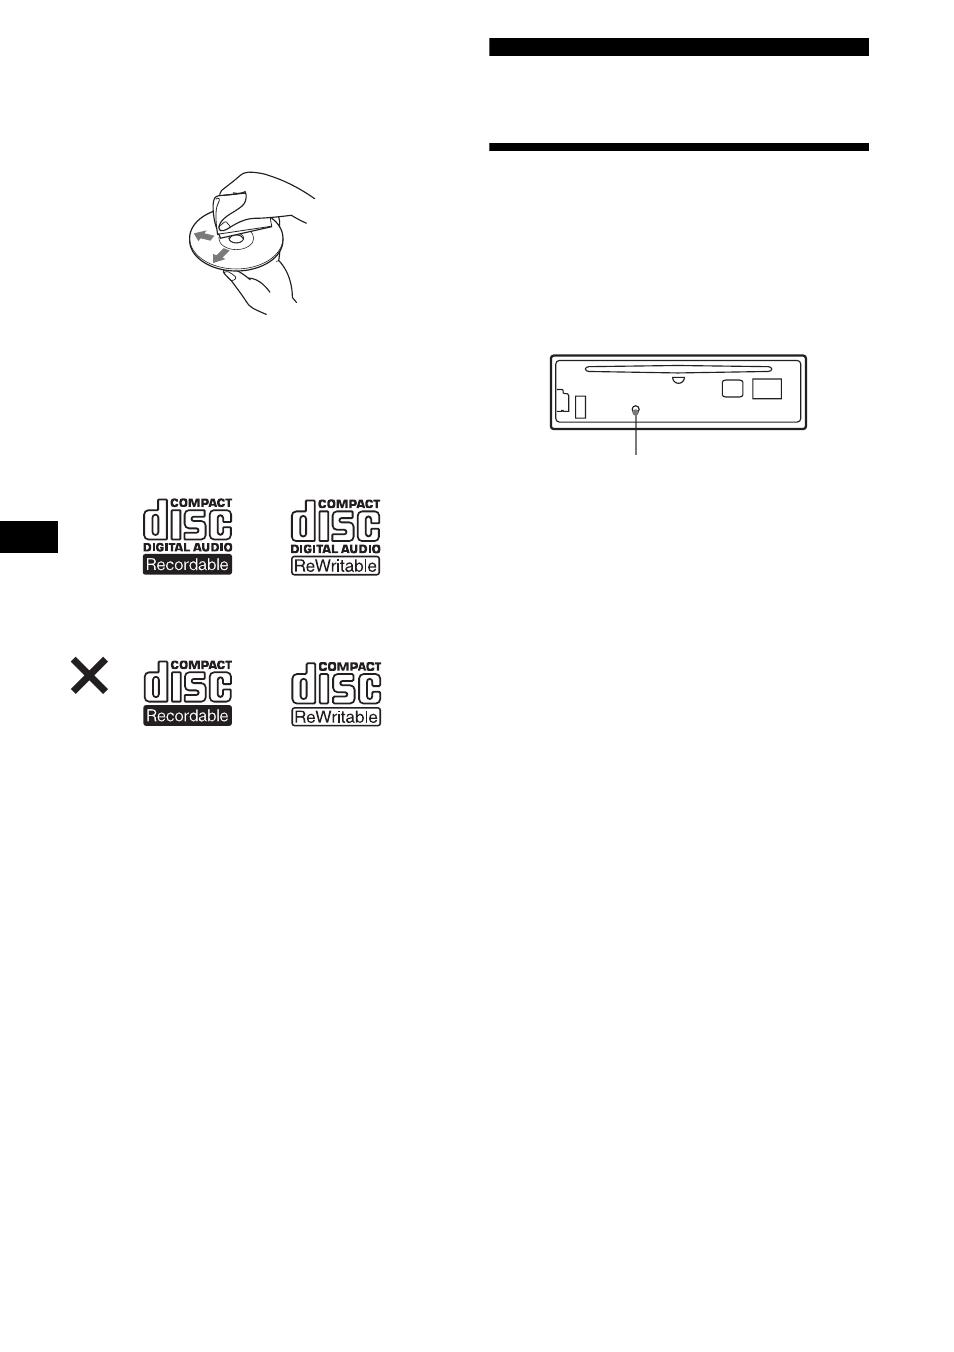 sony cdx fw700 wiring diagram wiring library rh 85 codingcommunity de